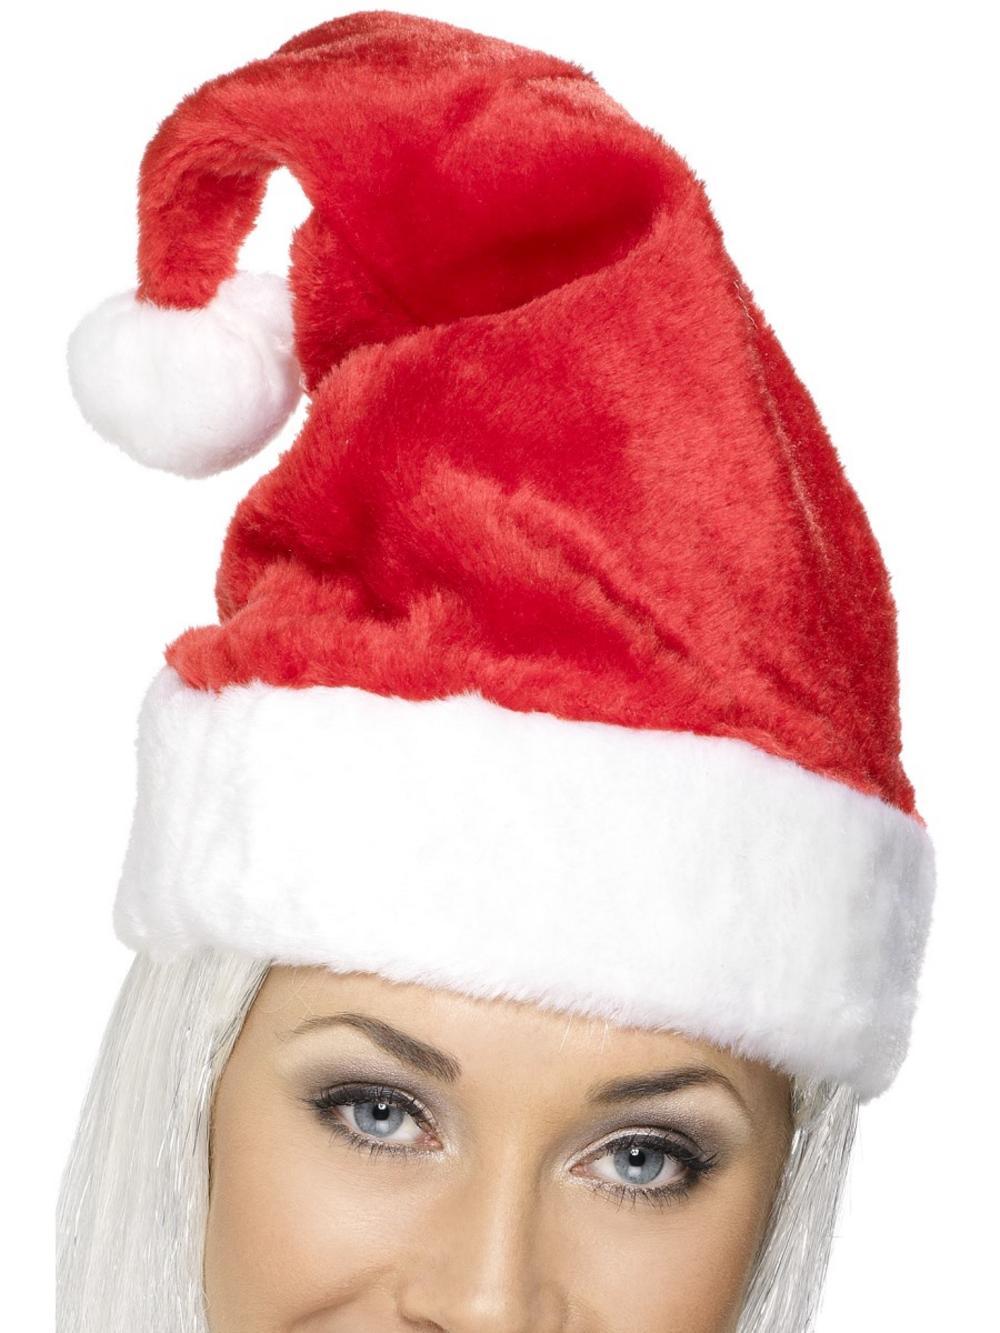 8d5cfd8bf8da0 Deluxe Santa Hat